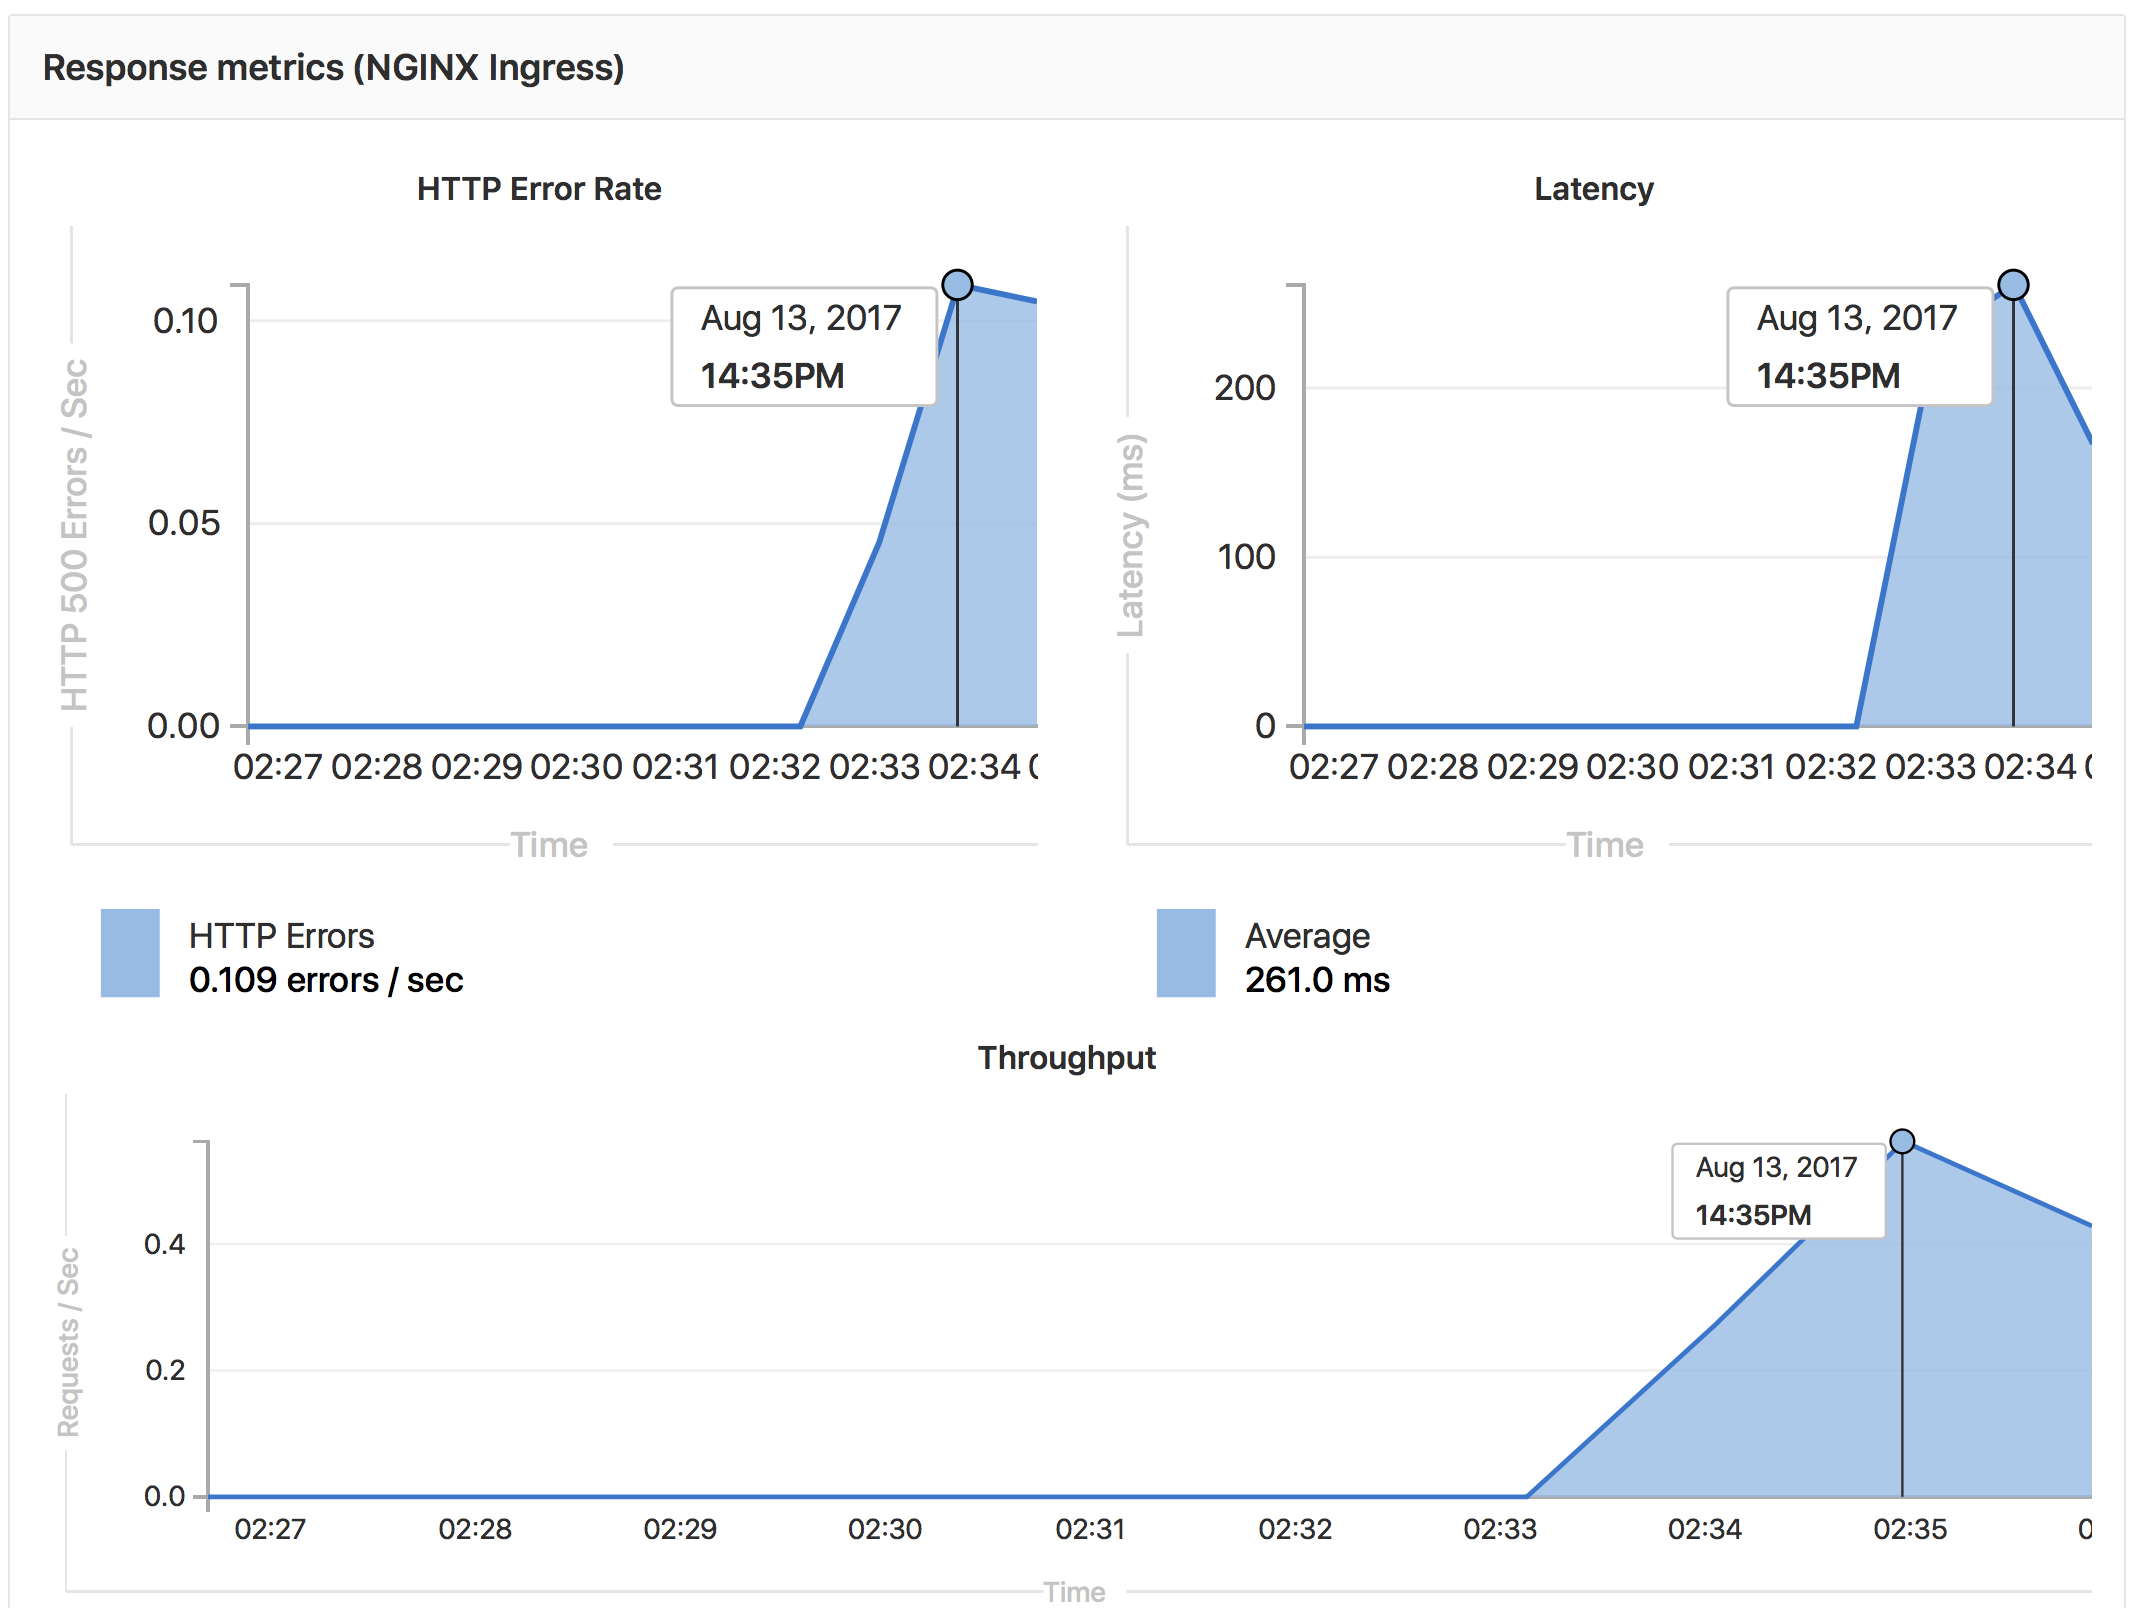 doc/topics/autodevops/img/auto_monitoring.png